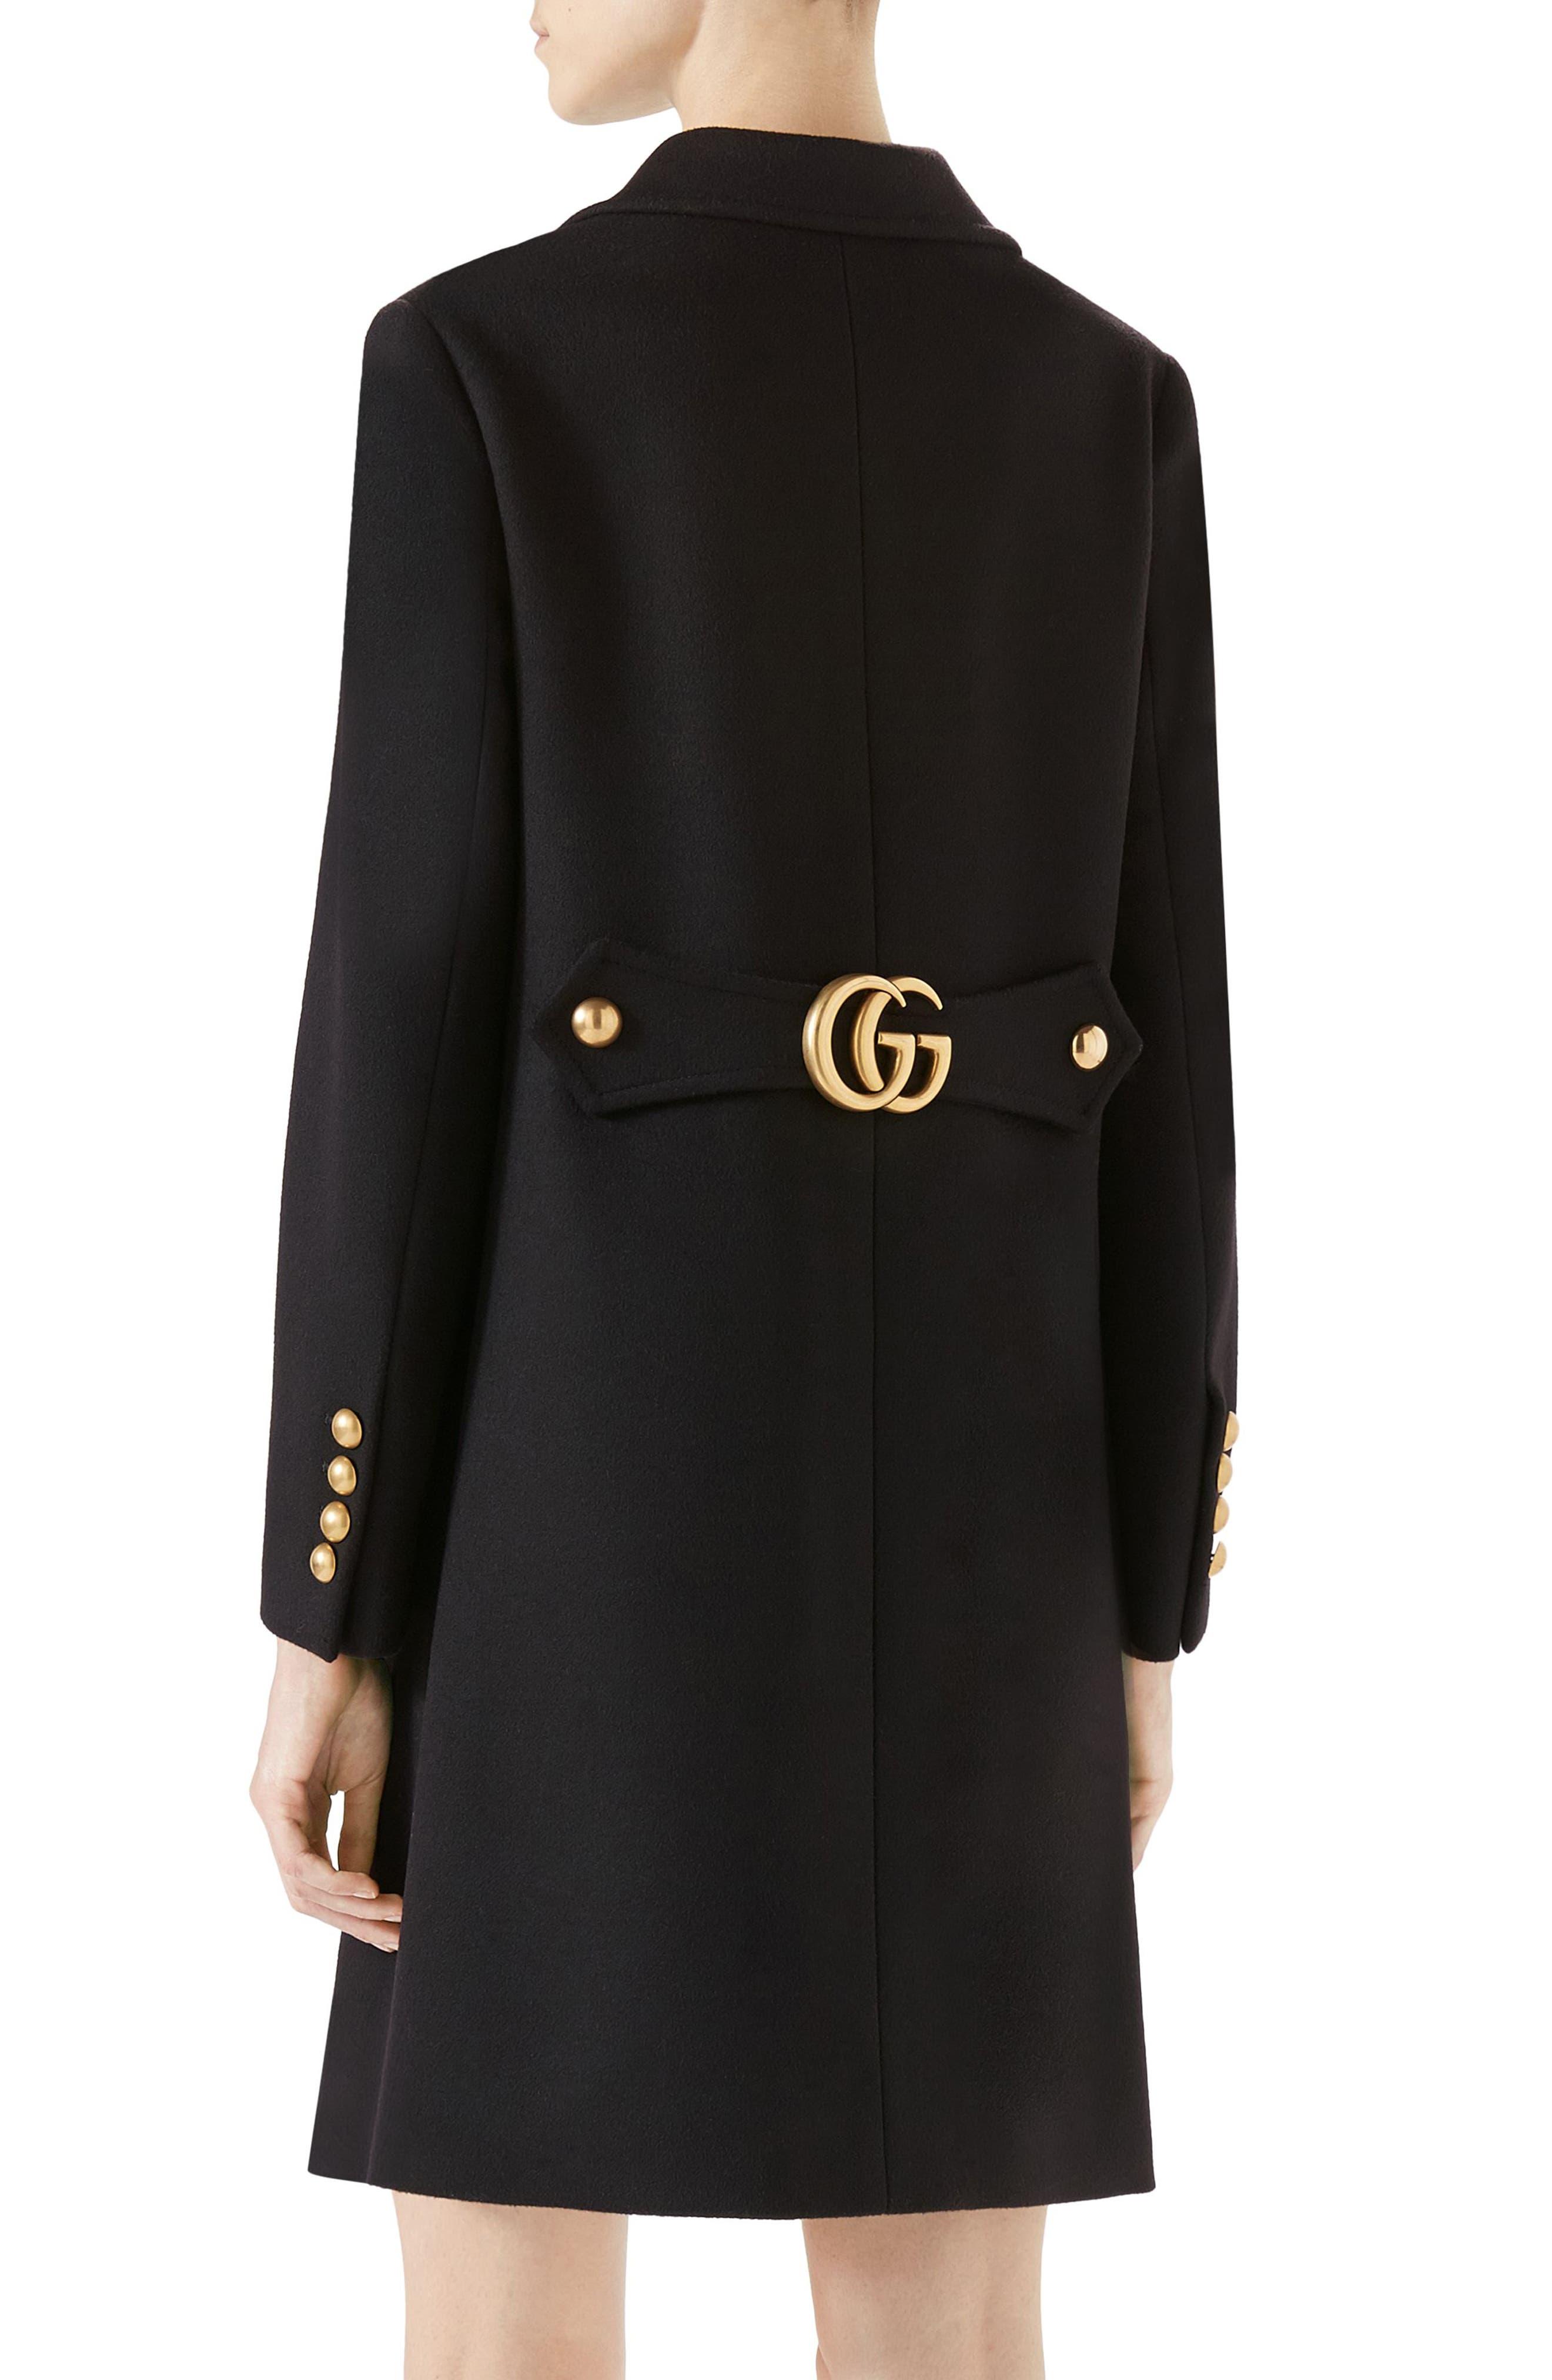 Double G Wool Coat